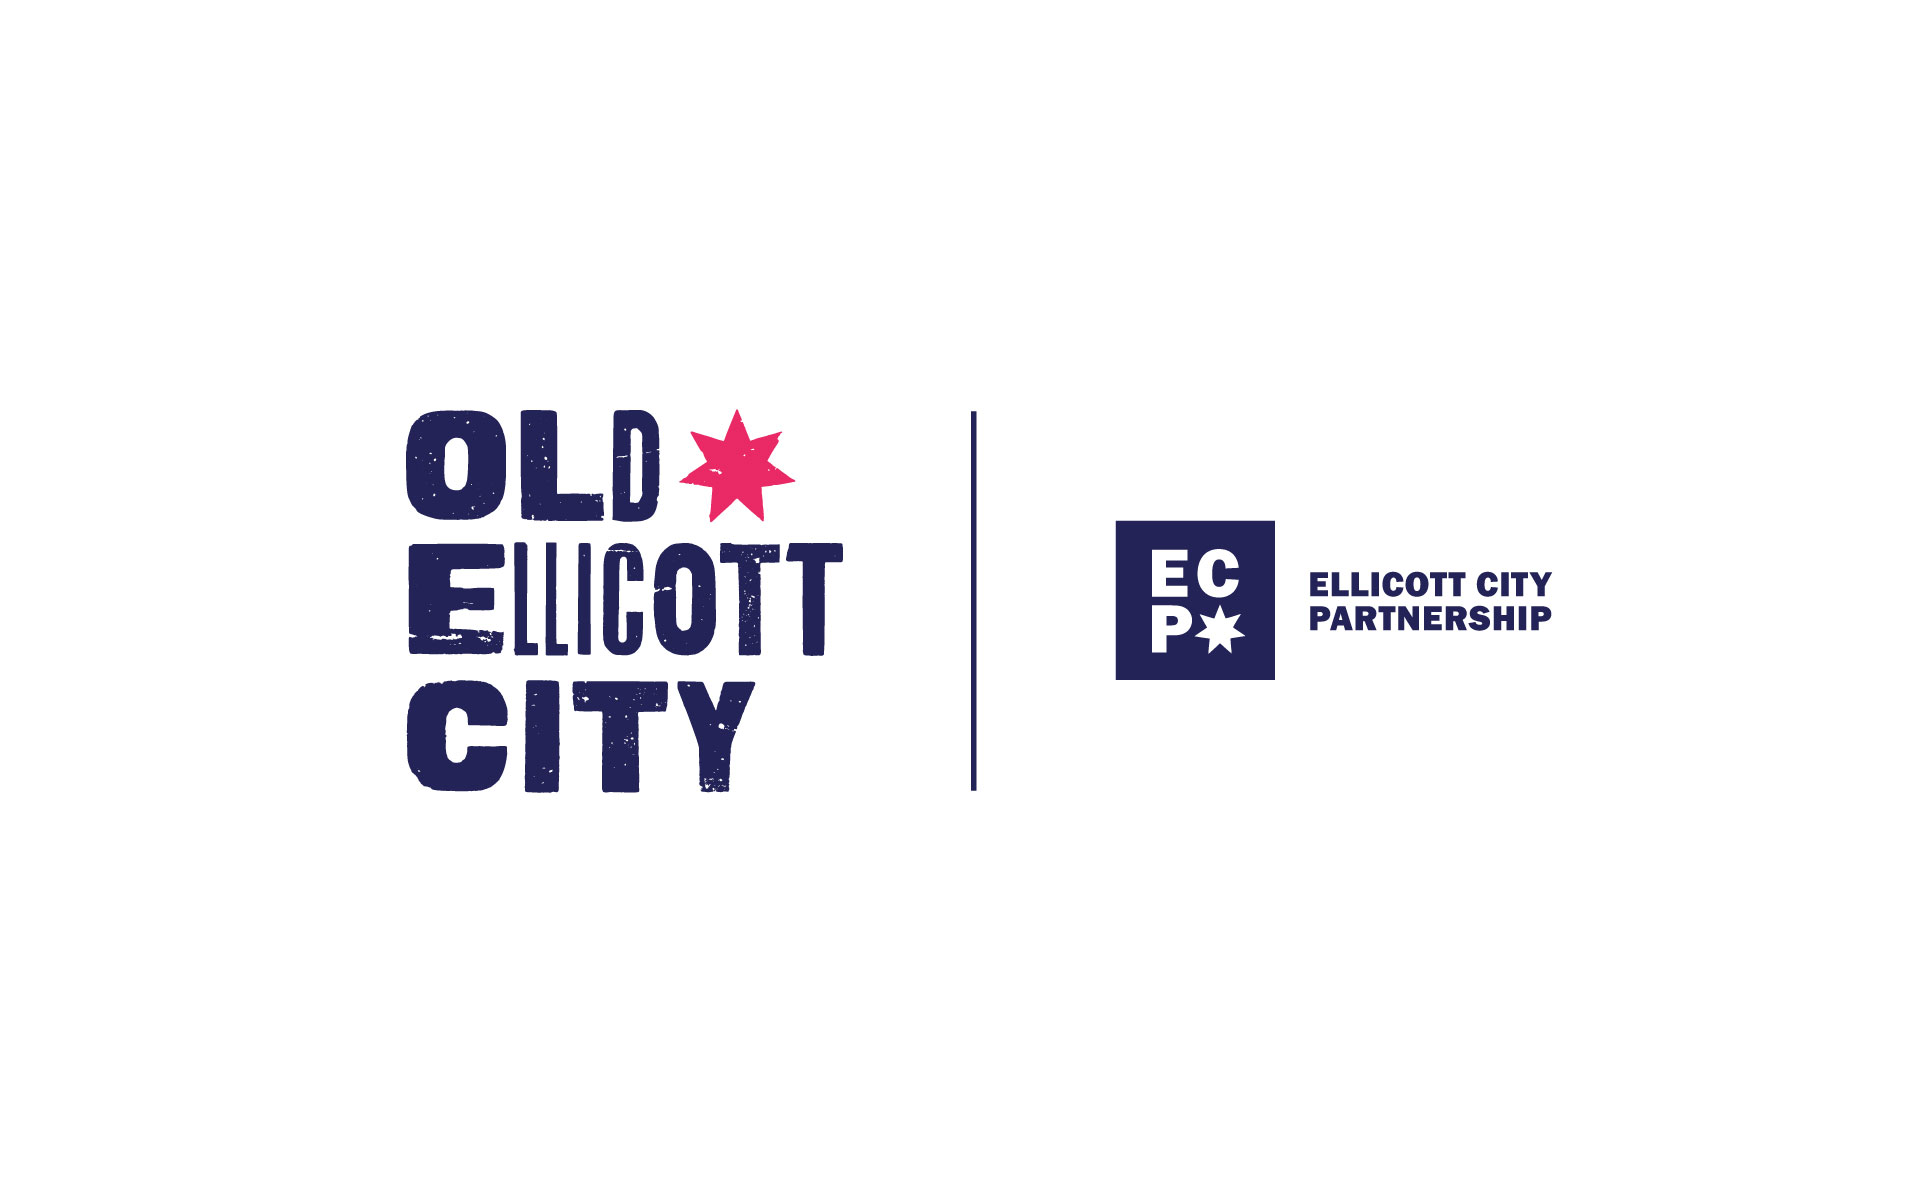 old_ellicott_city_02